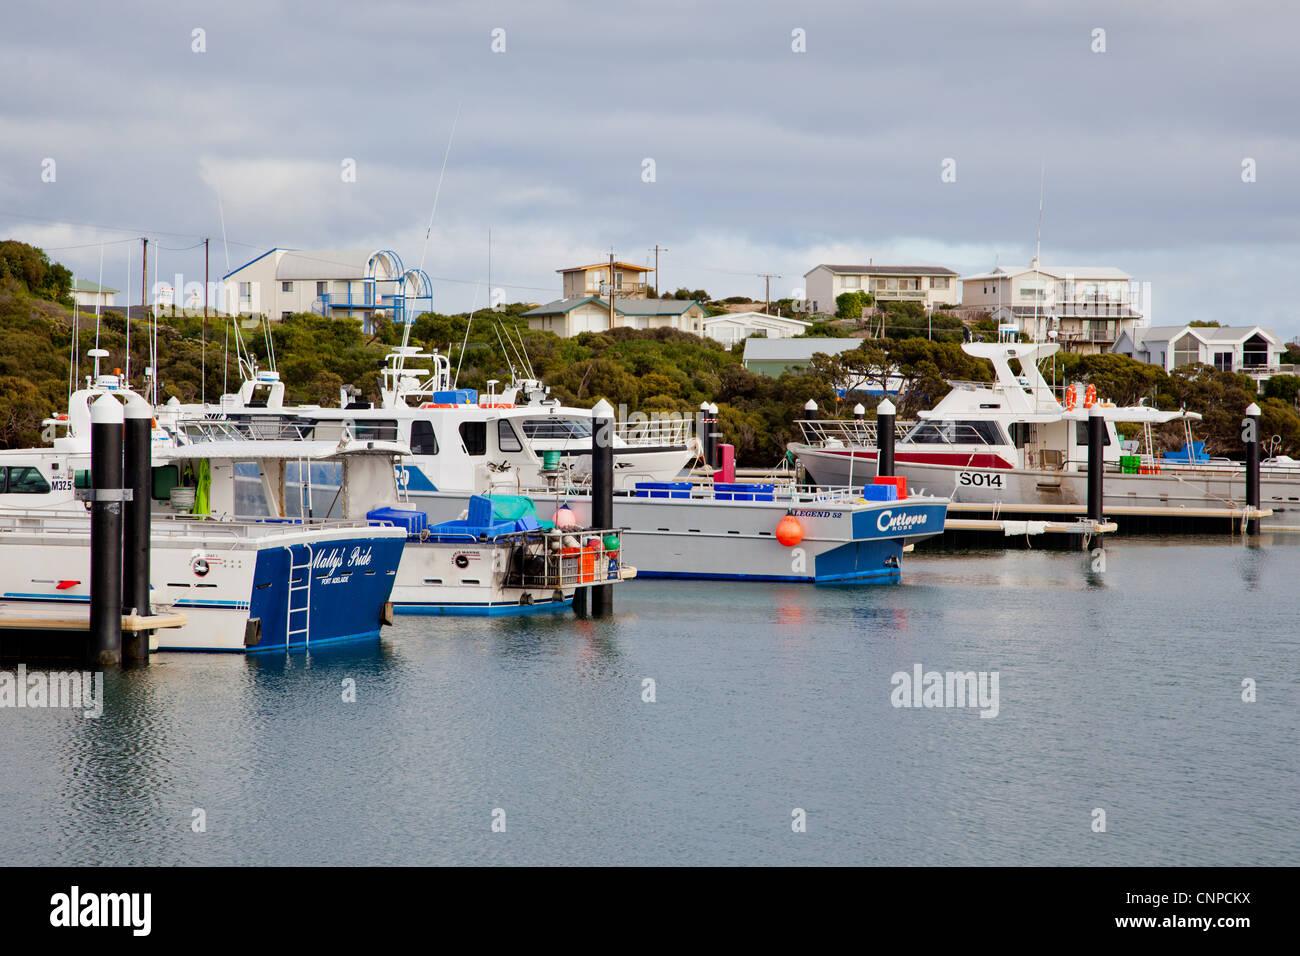 Robe Marina. Limestone Coast. South East. South Australia. - Stock Image